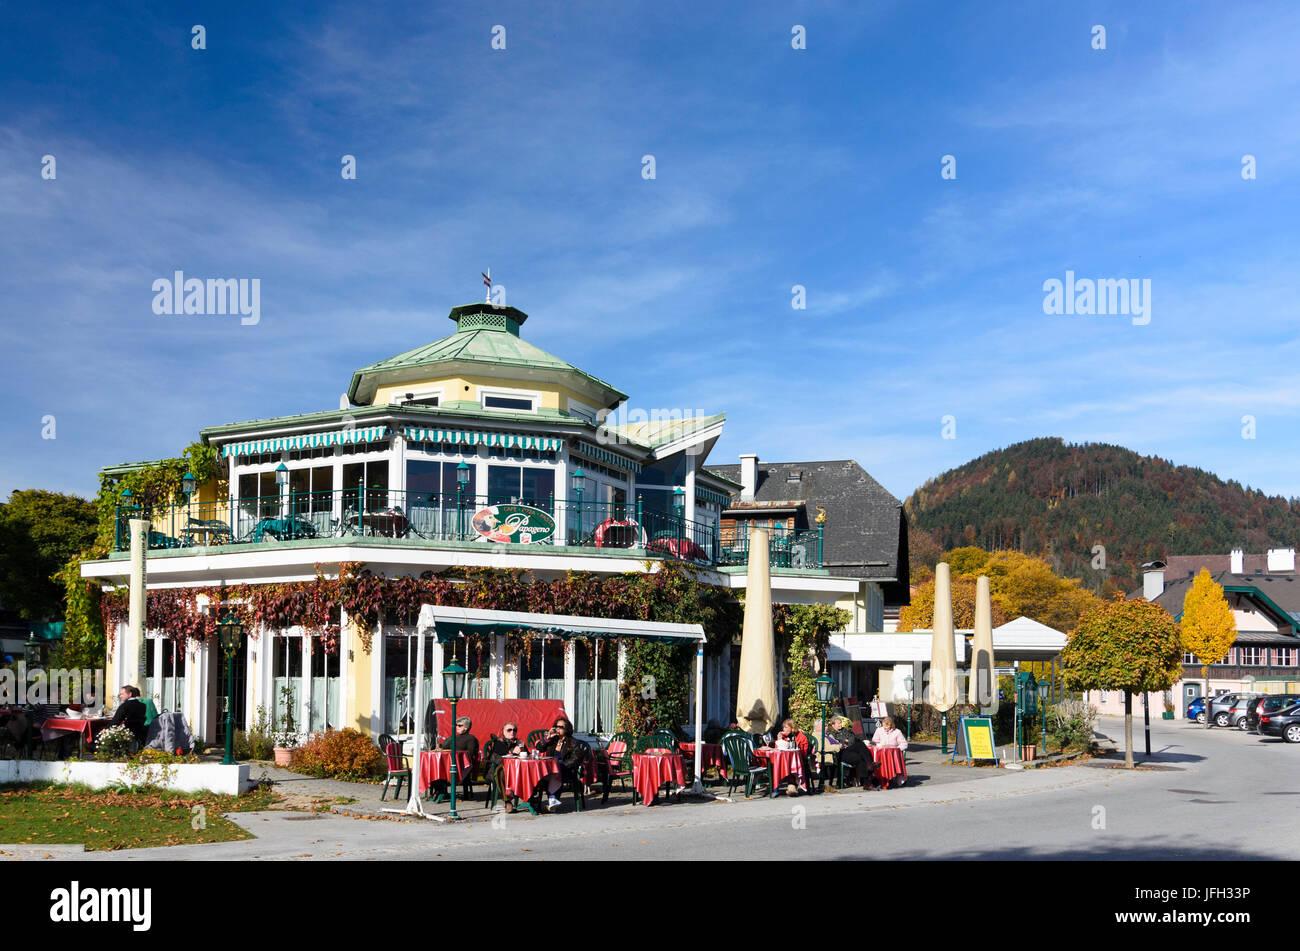 Cafe in the Wolfgangsee, Austria, Salzburg, Salzkammergut, Sankt Gilgen - Stock Image